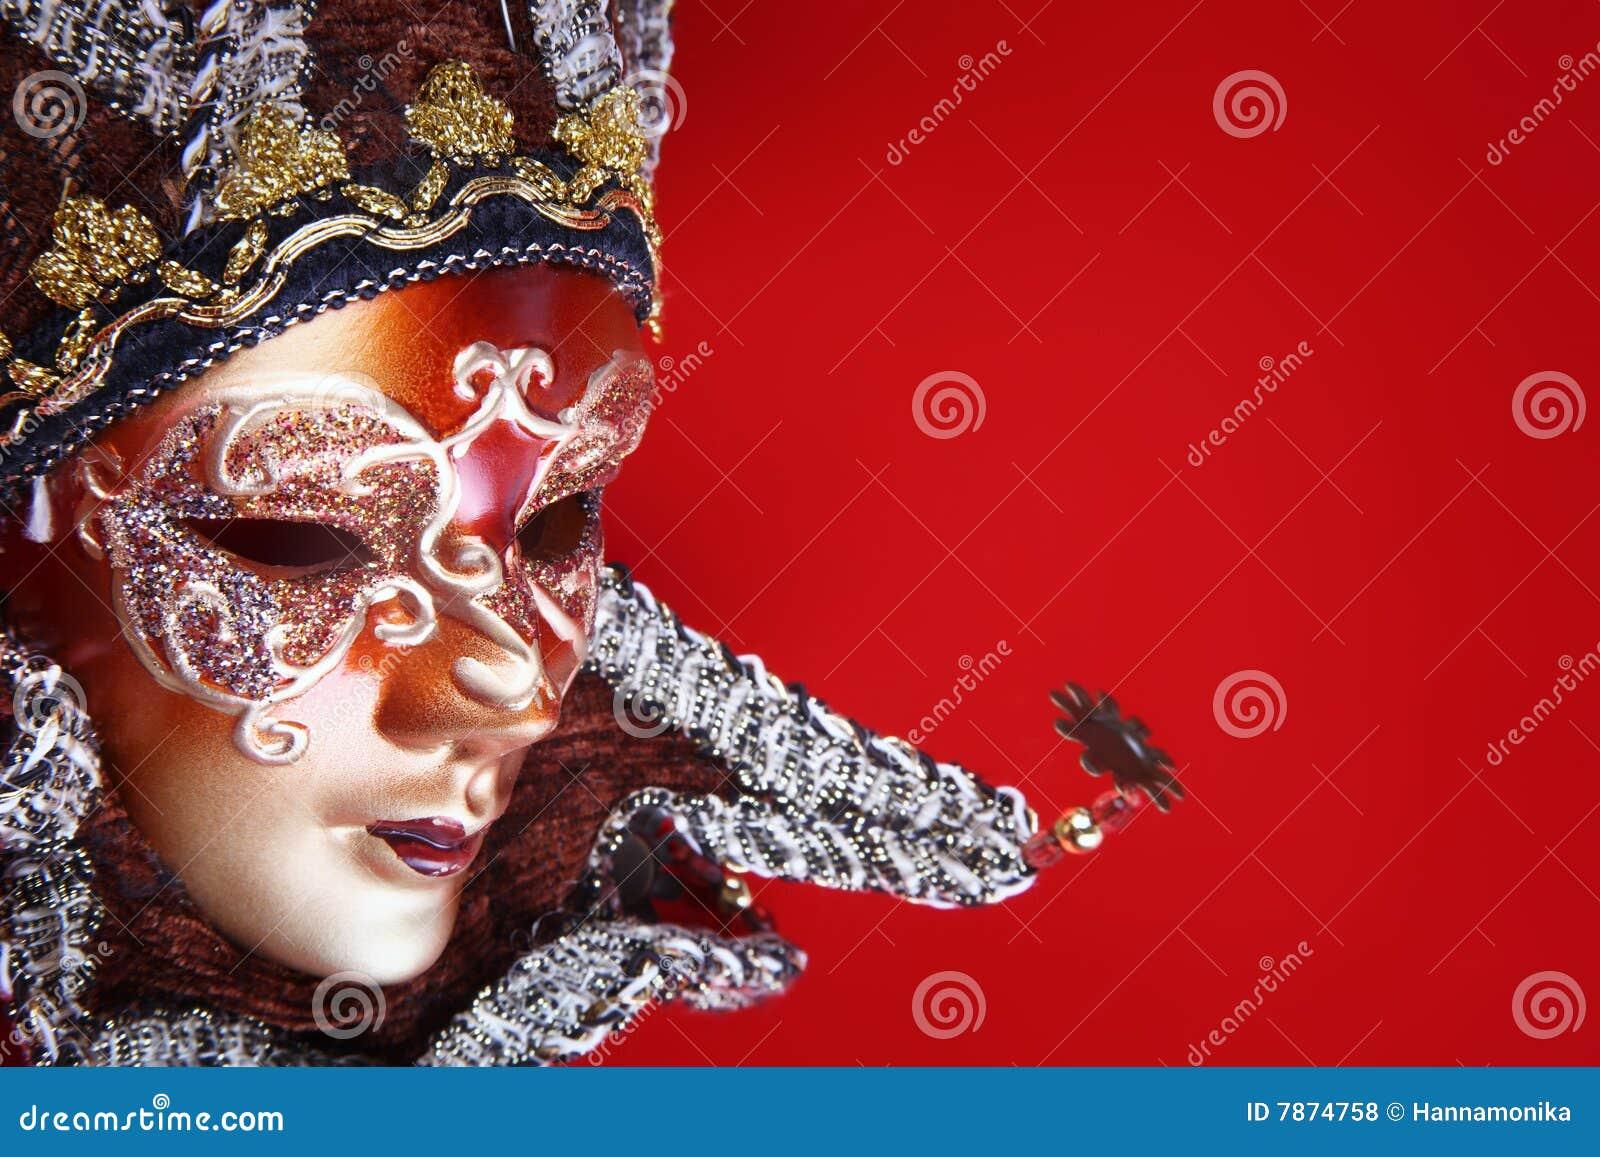 Rouge fleuri de masque de carnaval de fond